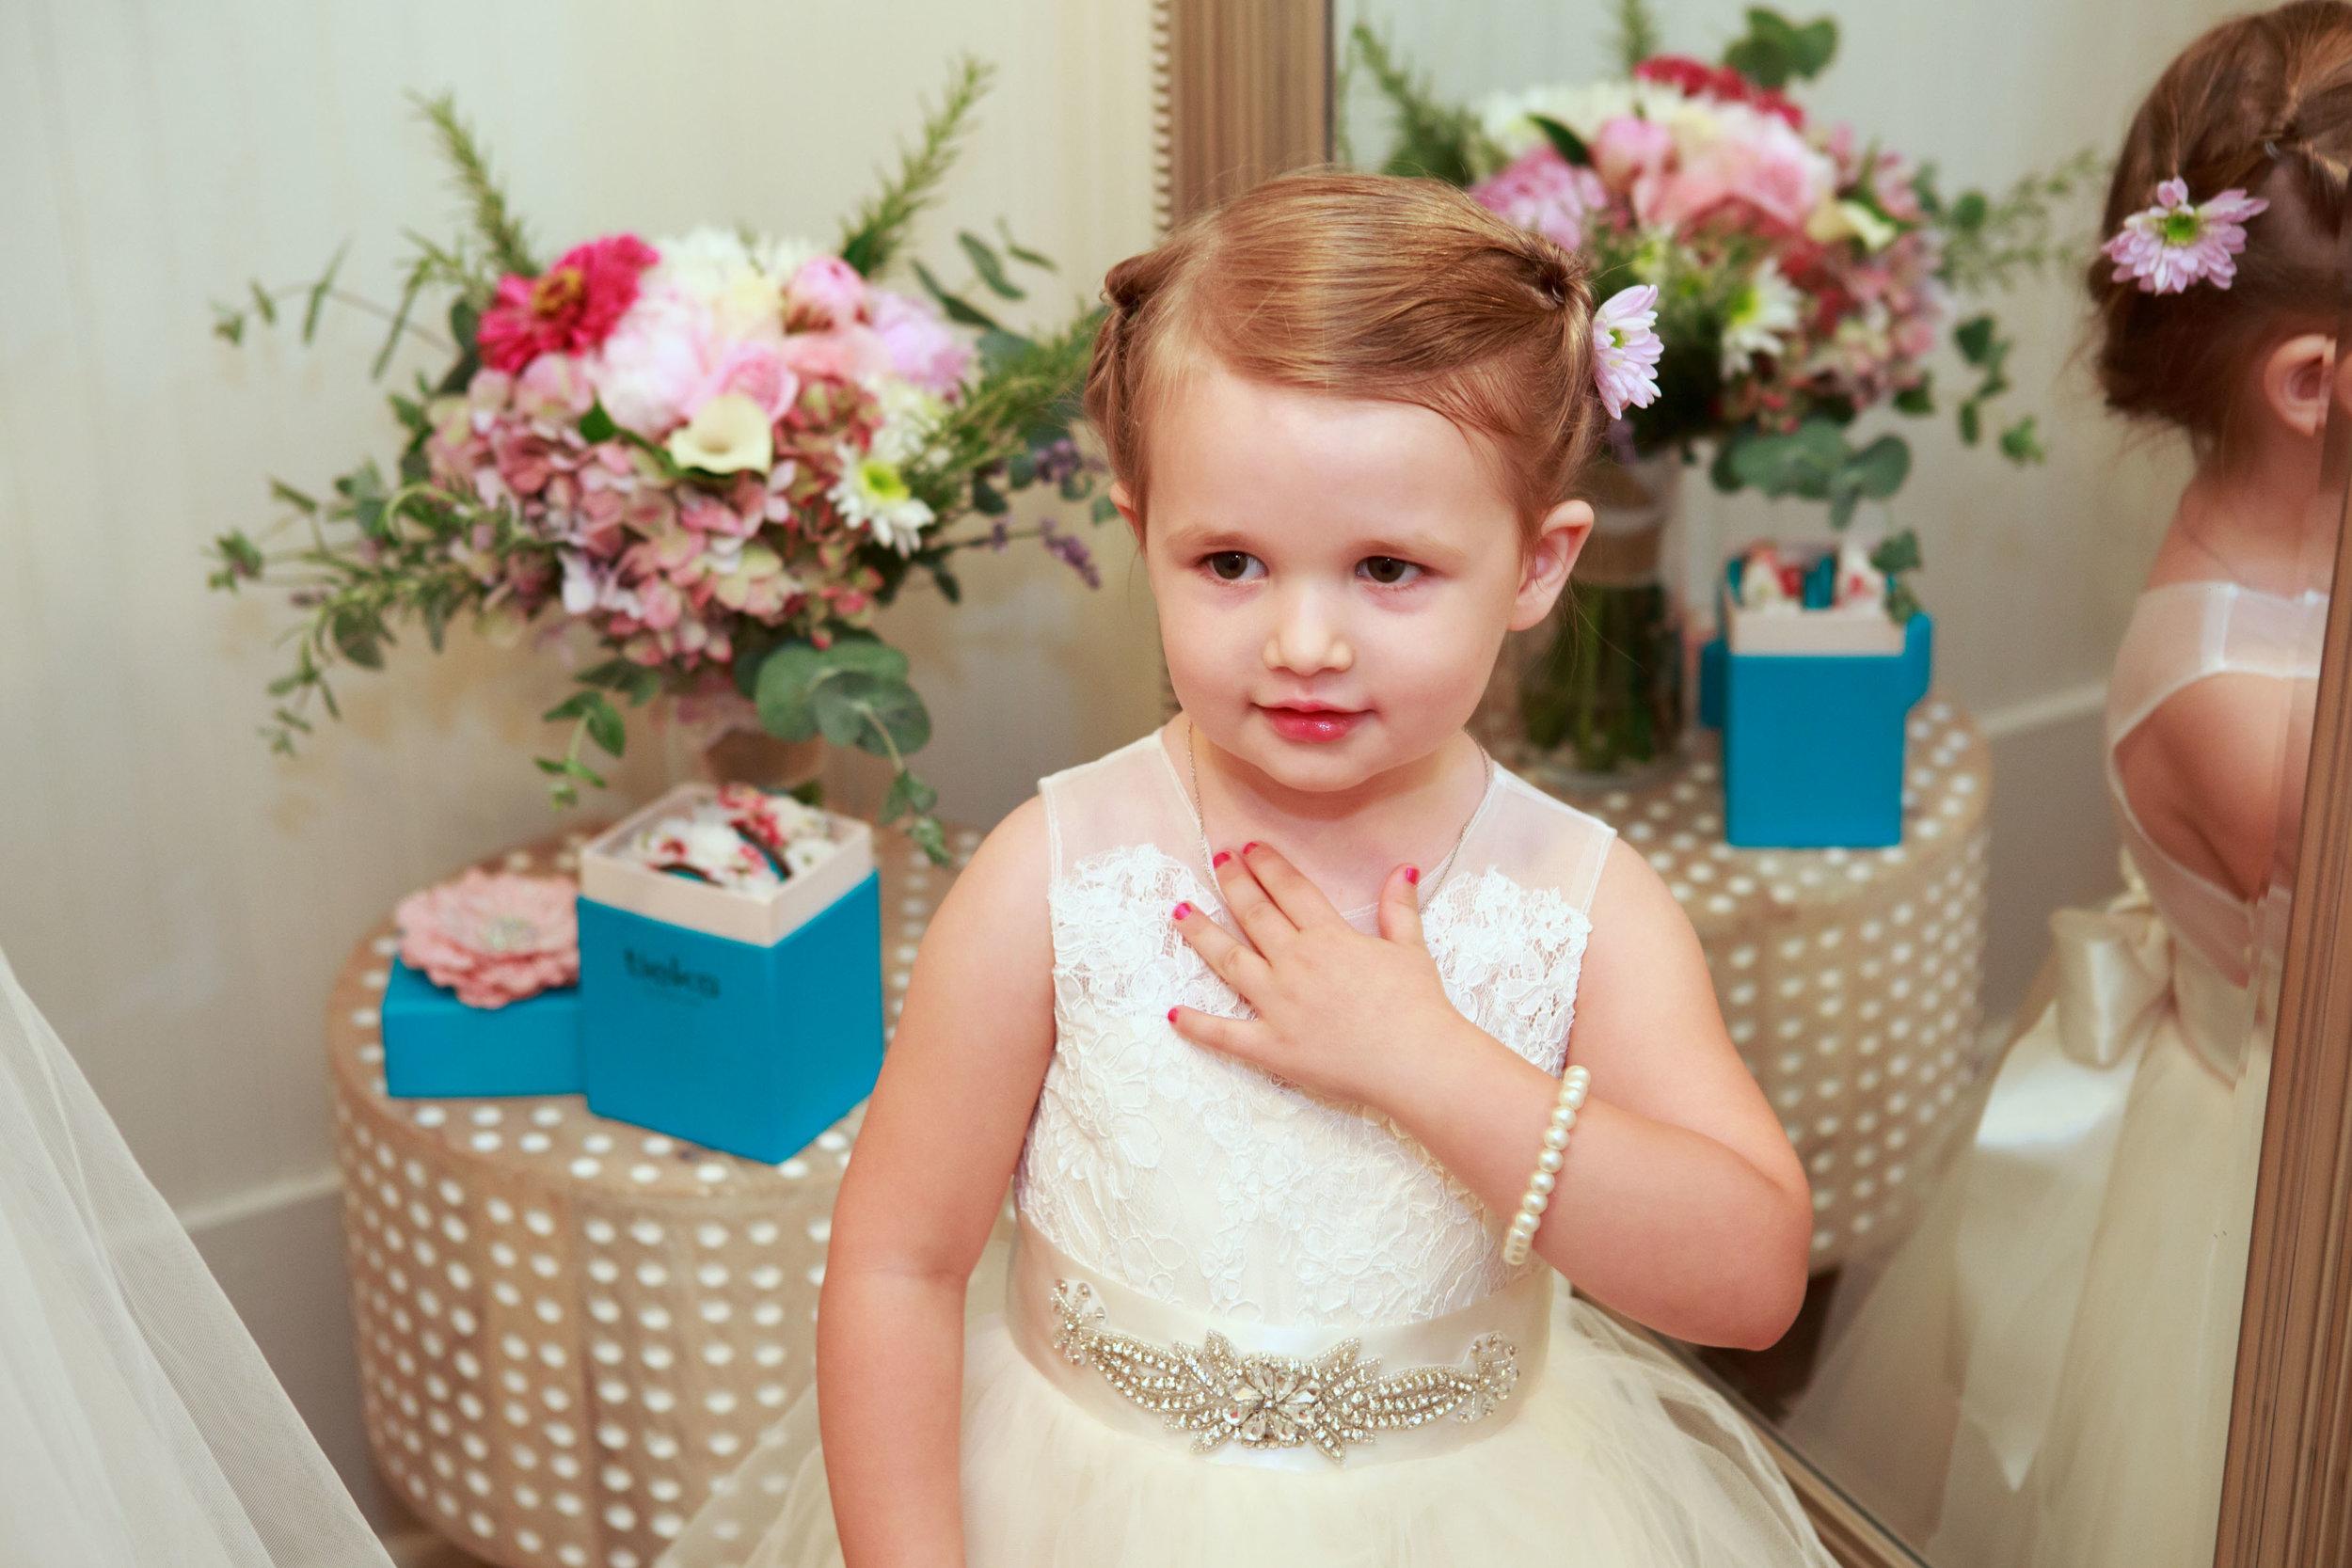 128-South-Wedding-Tiffany-Abruzzo-Photography-Girls-Prep-77.jpg